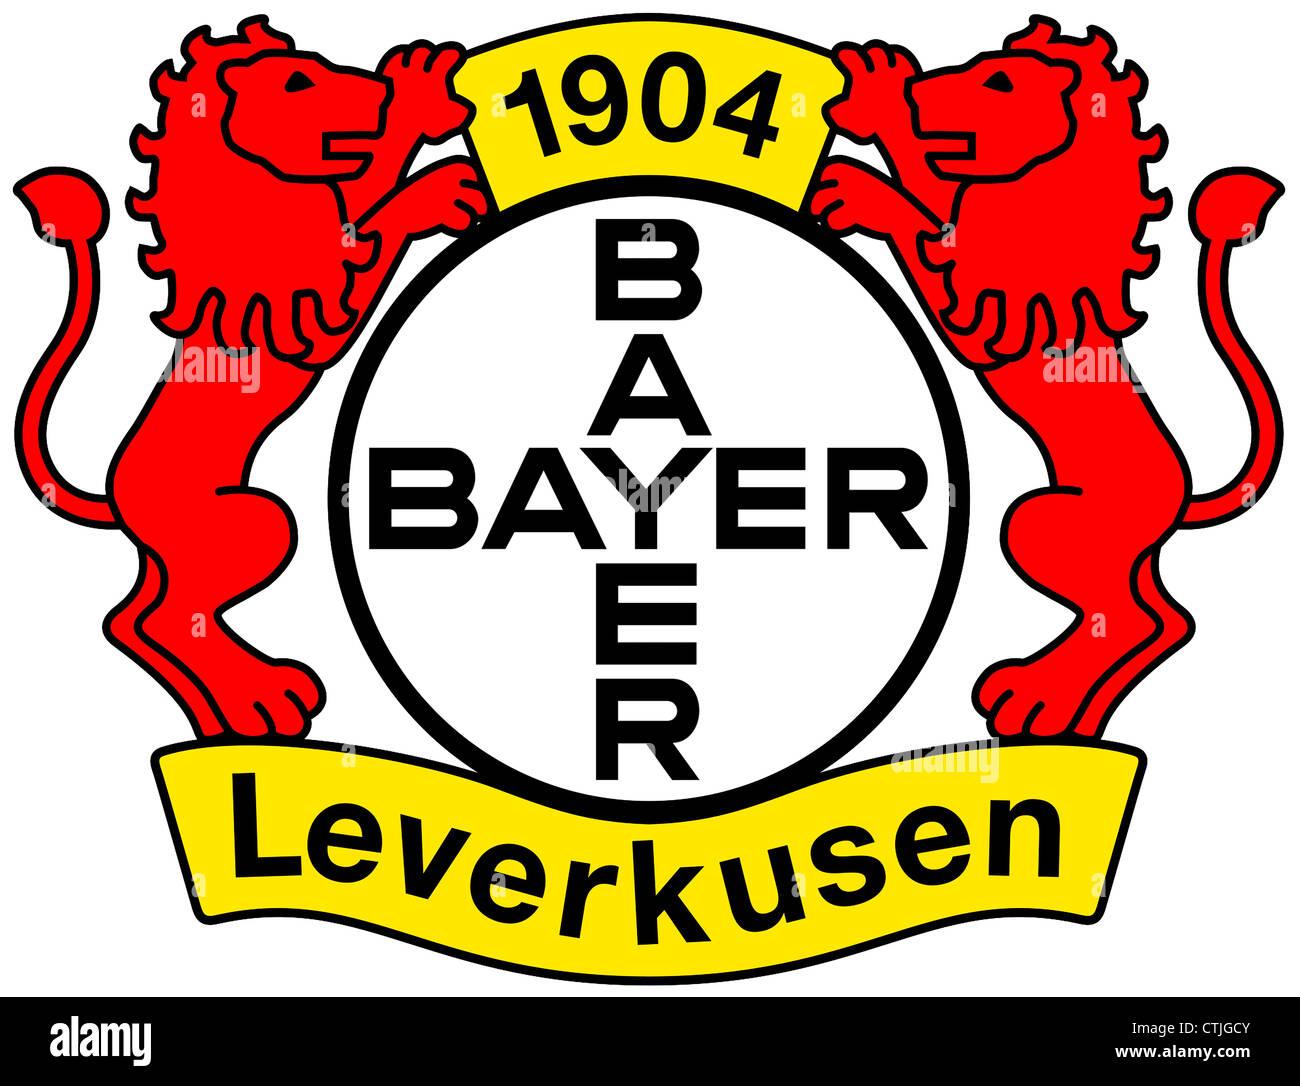 Logo of German football team Bayer 04 Leverkusen. - Stock Image